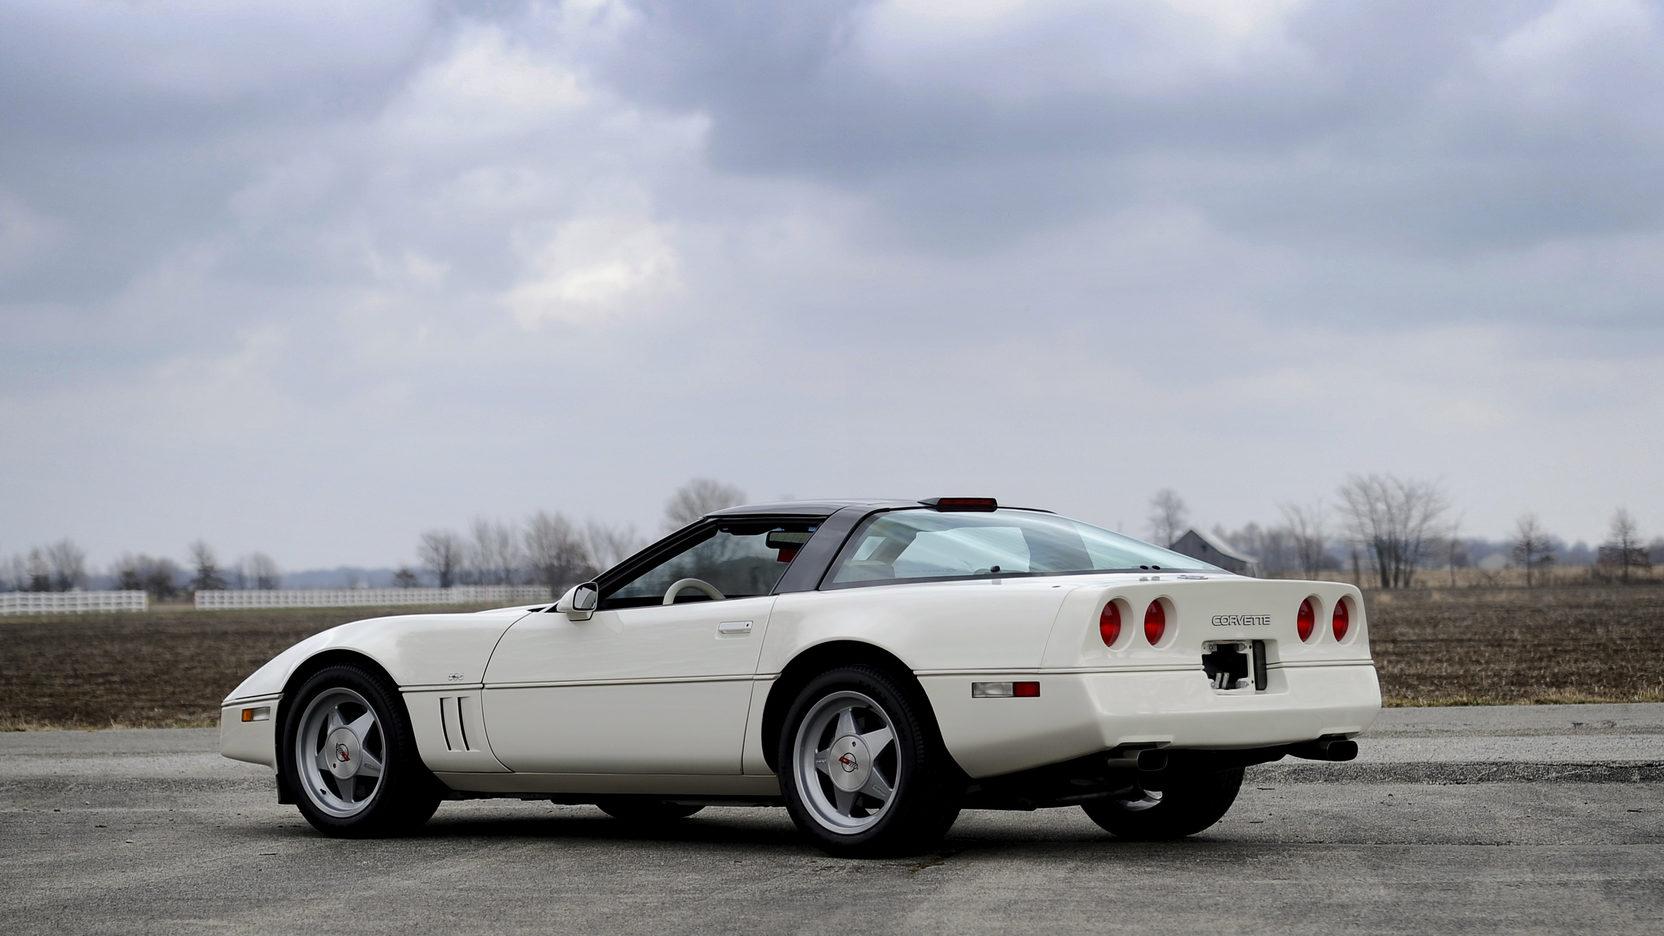 1988 Chevrolet Callaway Corvette rear 3/4